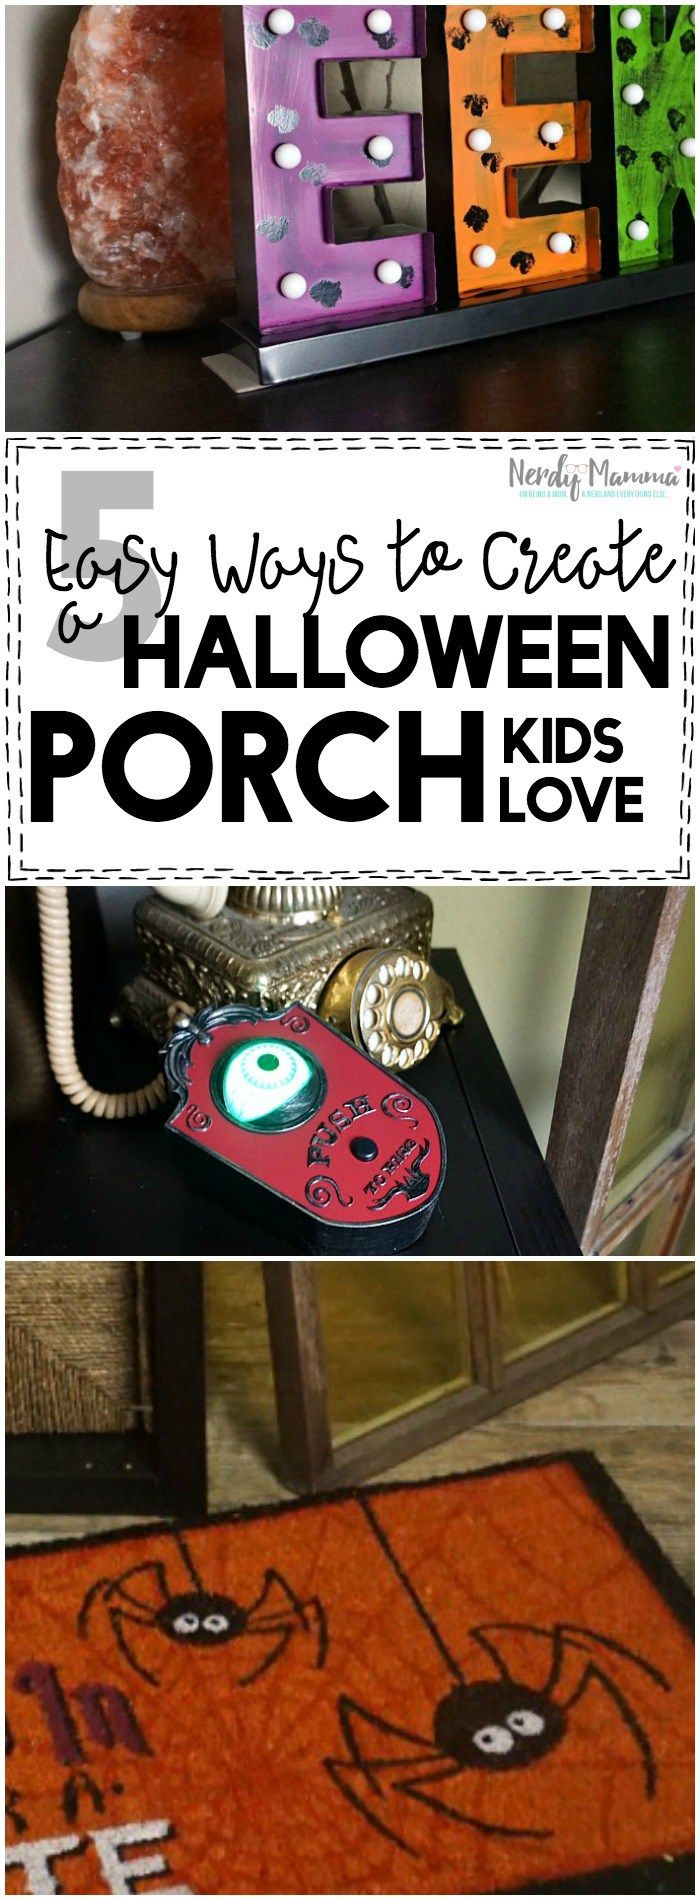 741 best Halloween Fun. BOO! images on Pinterest | Halloween ...